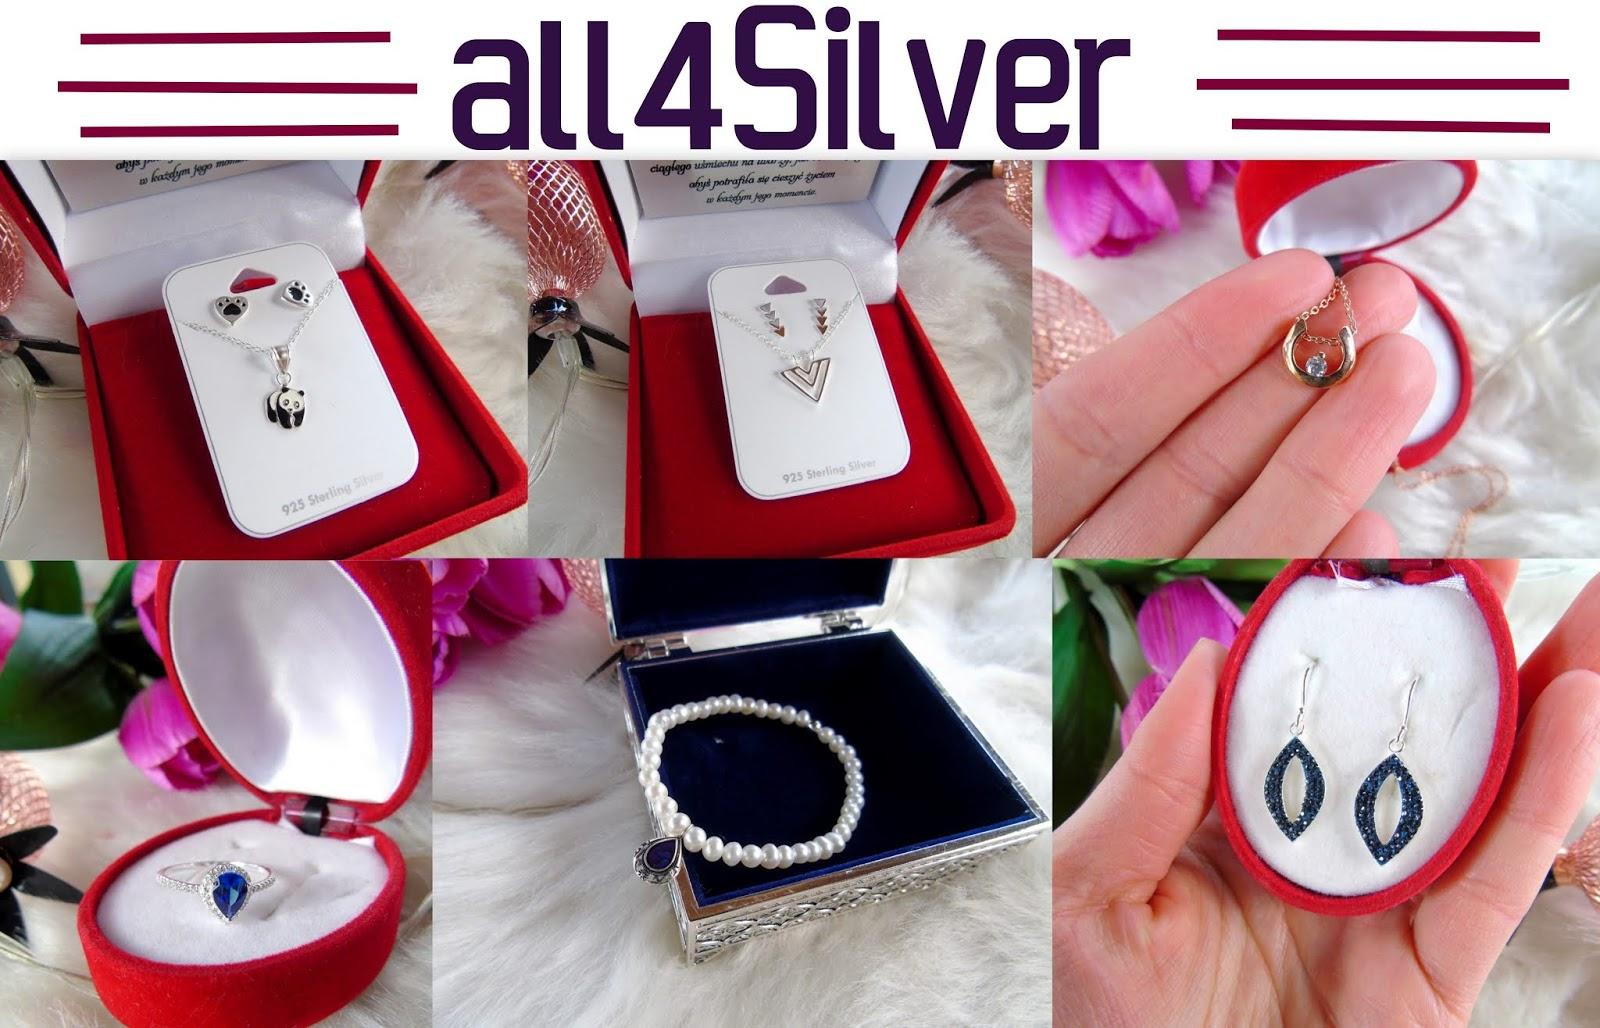 BLOG TESTERSKI: Hurtownia all4Silver - bo biżuteria ze srebra nie musi być wcale droga!